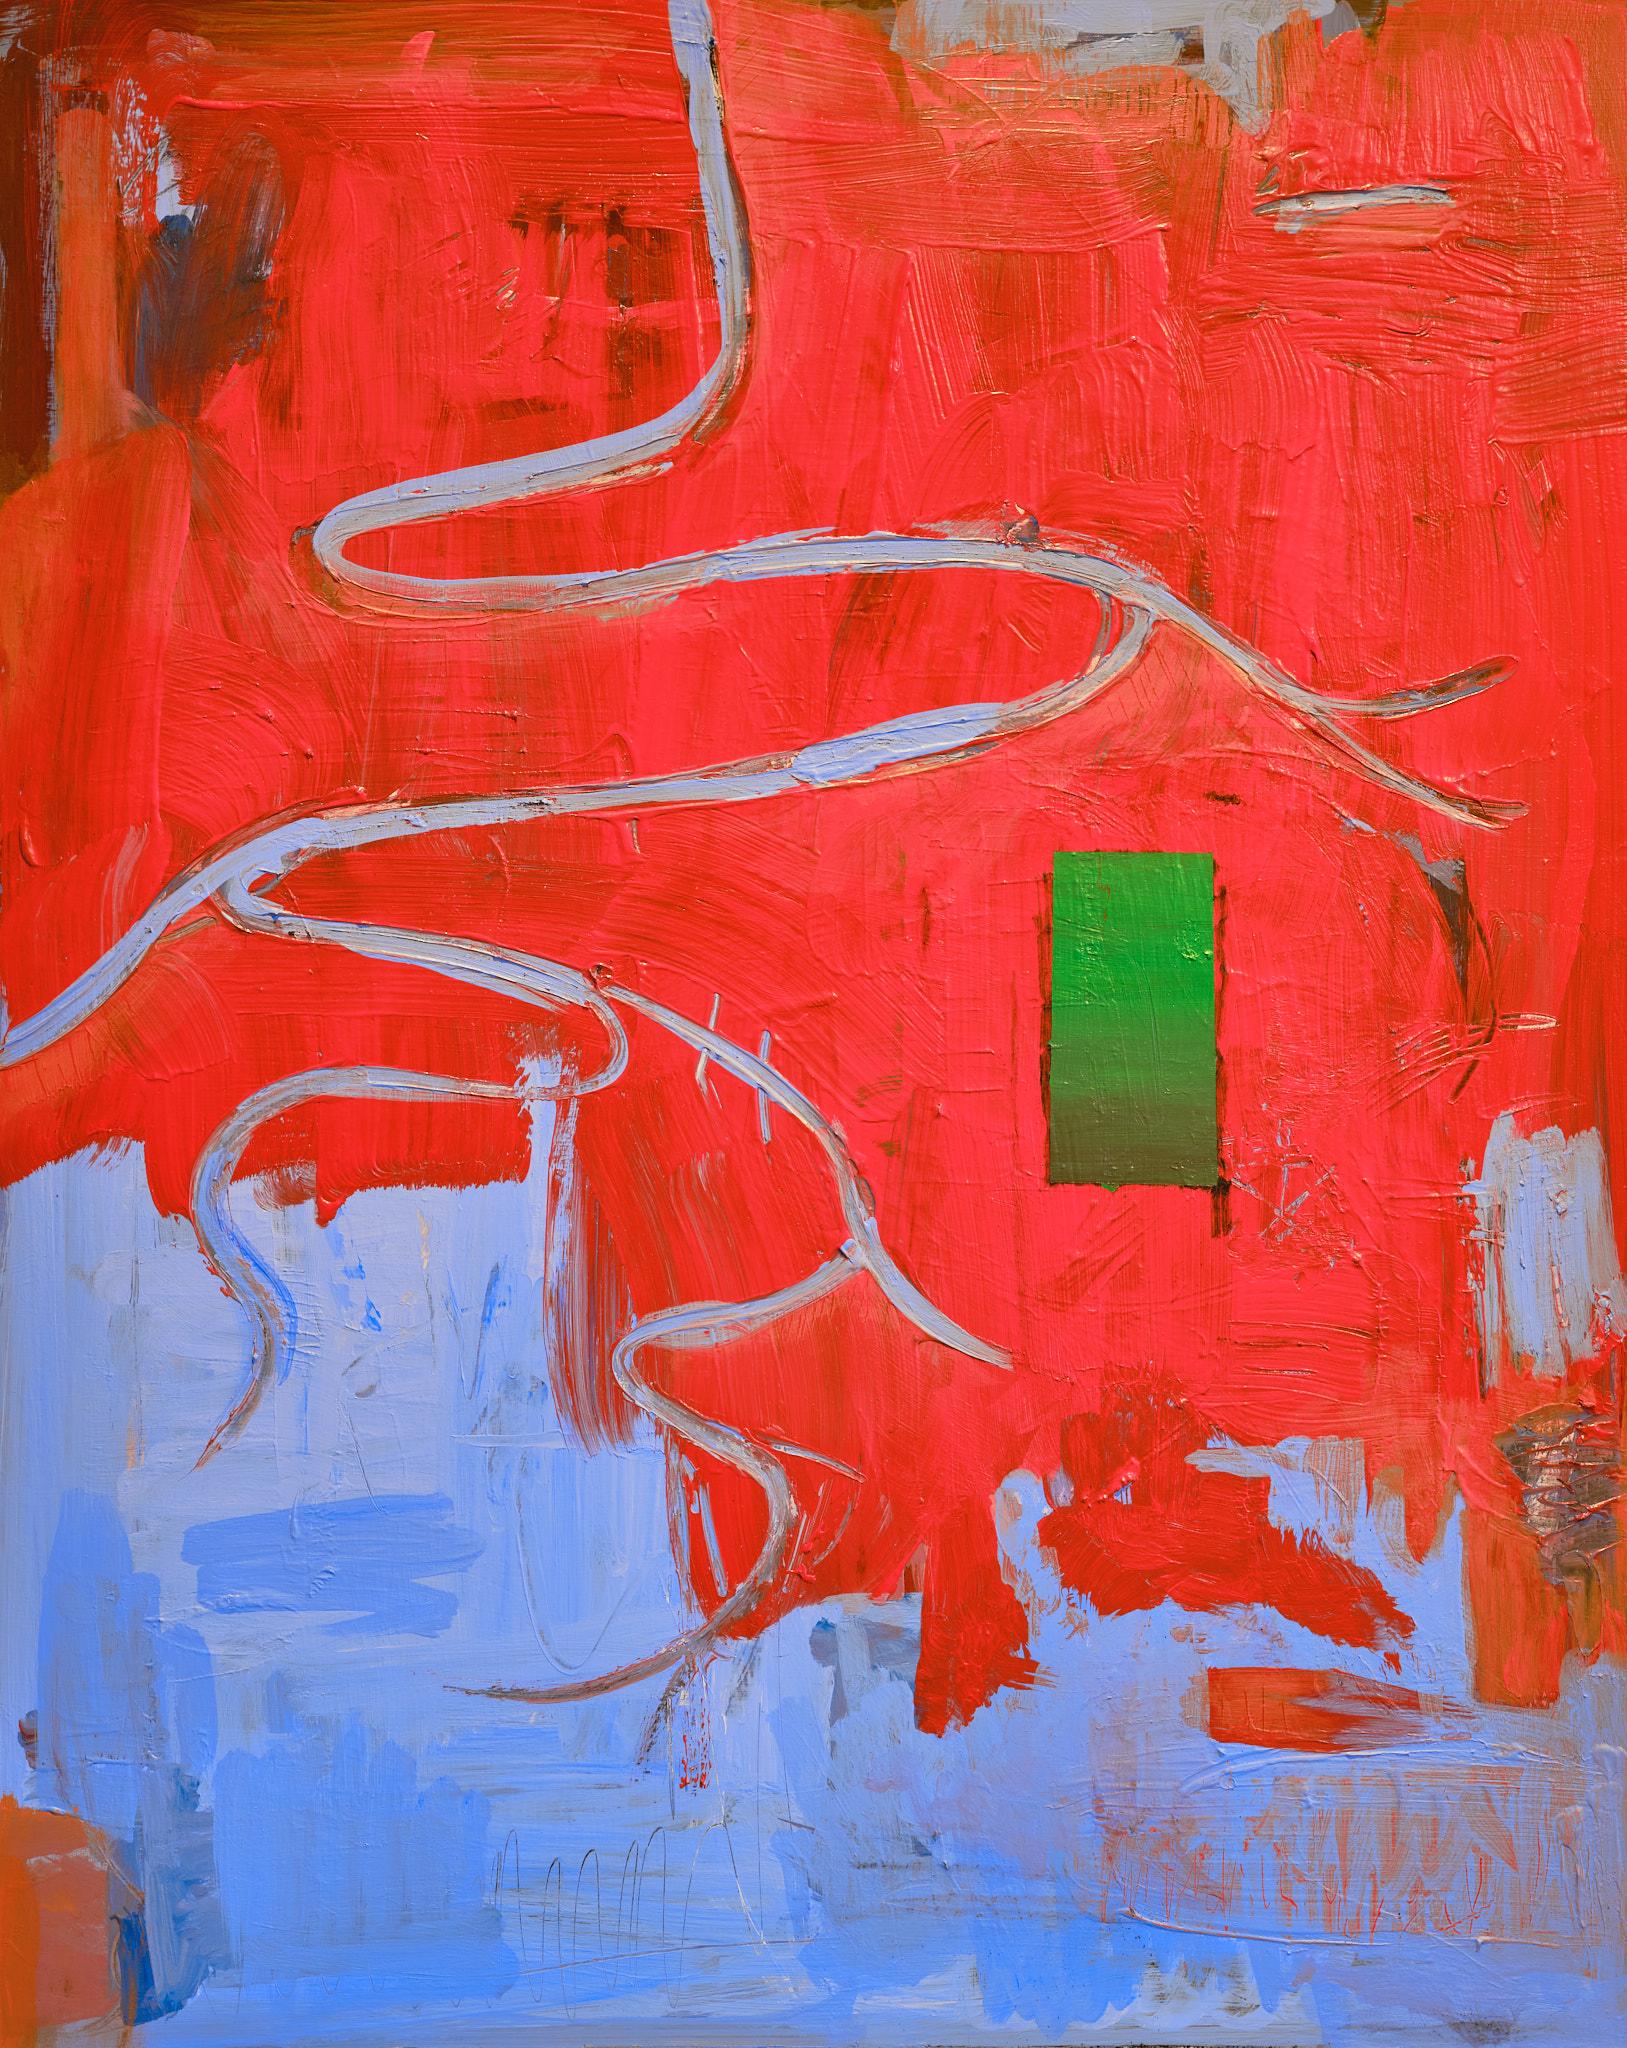 Wandering Nerve, oil & acrylic on board  - Evan Kaufman